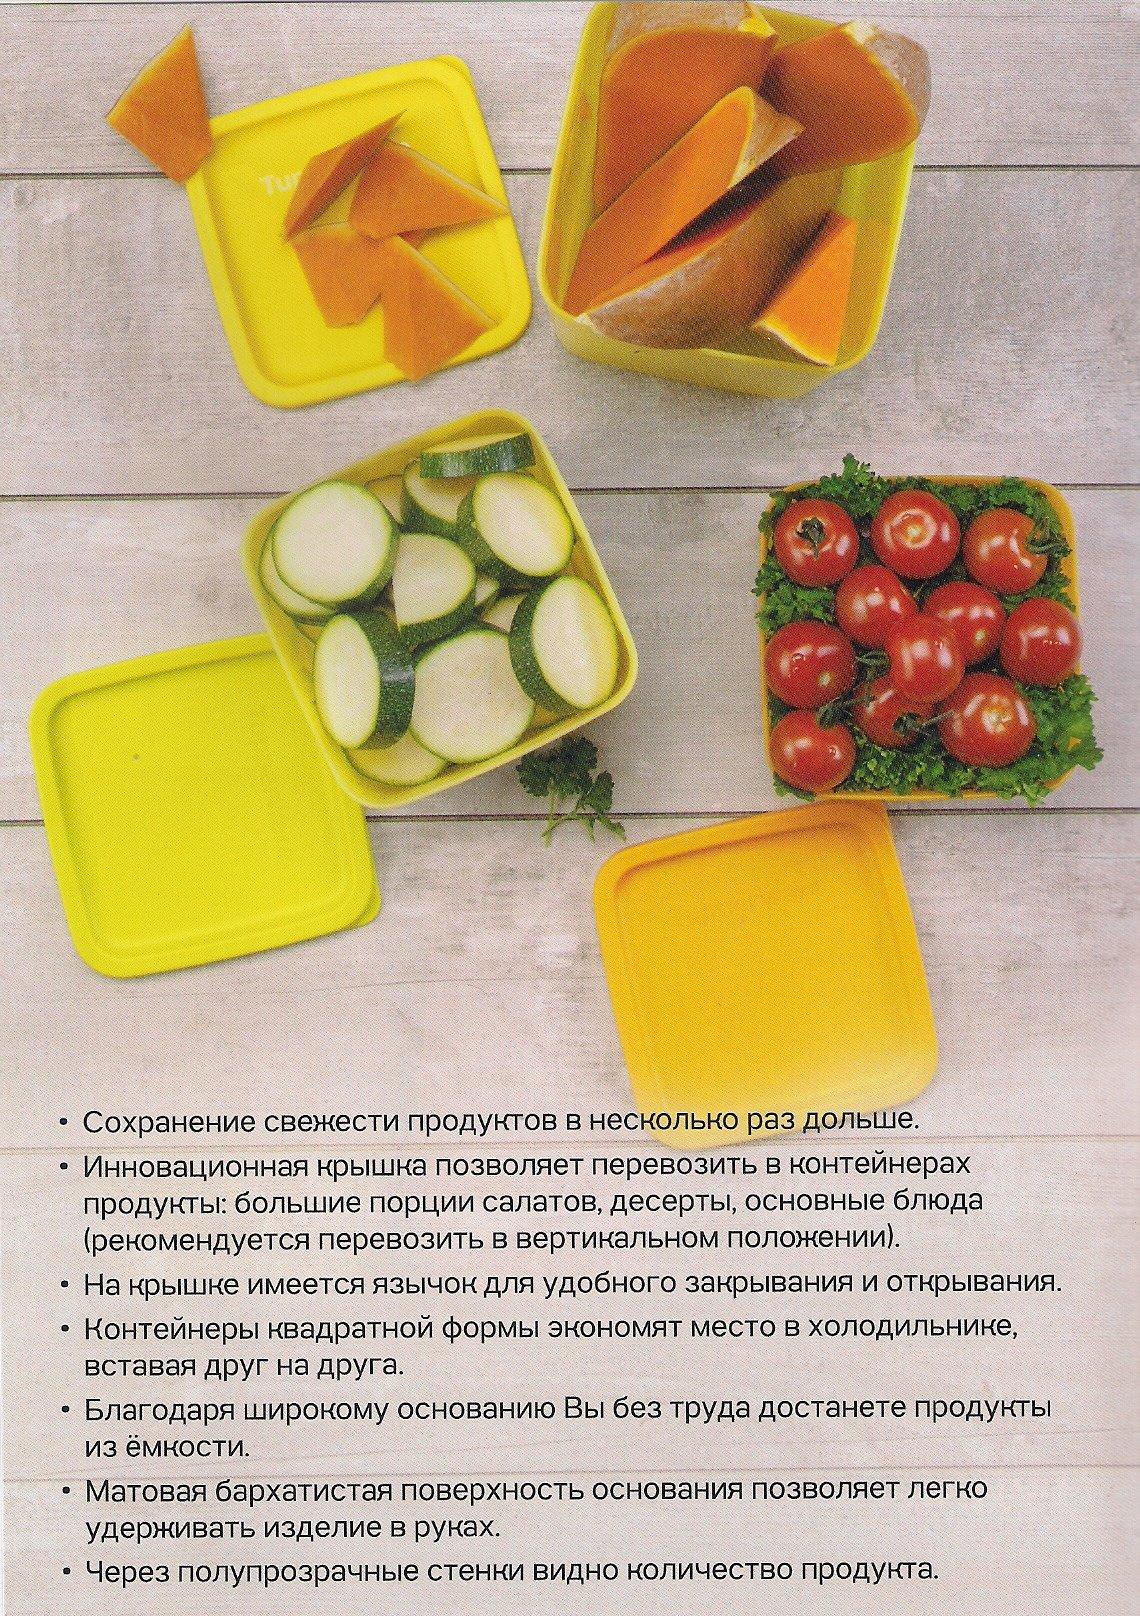 http://tupperware-online.ru/images/upload/4g.jpg